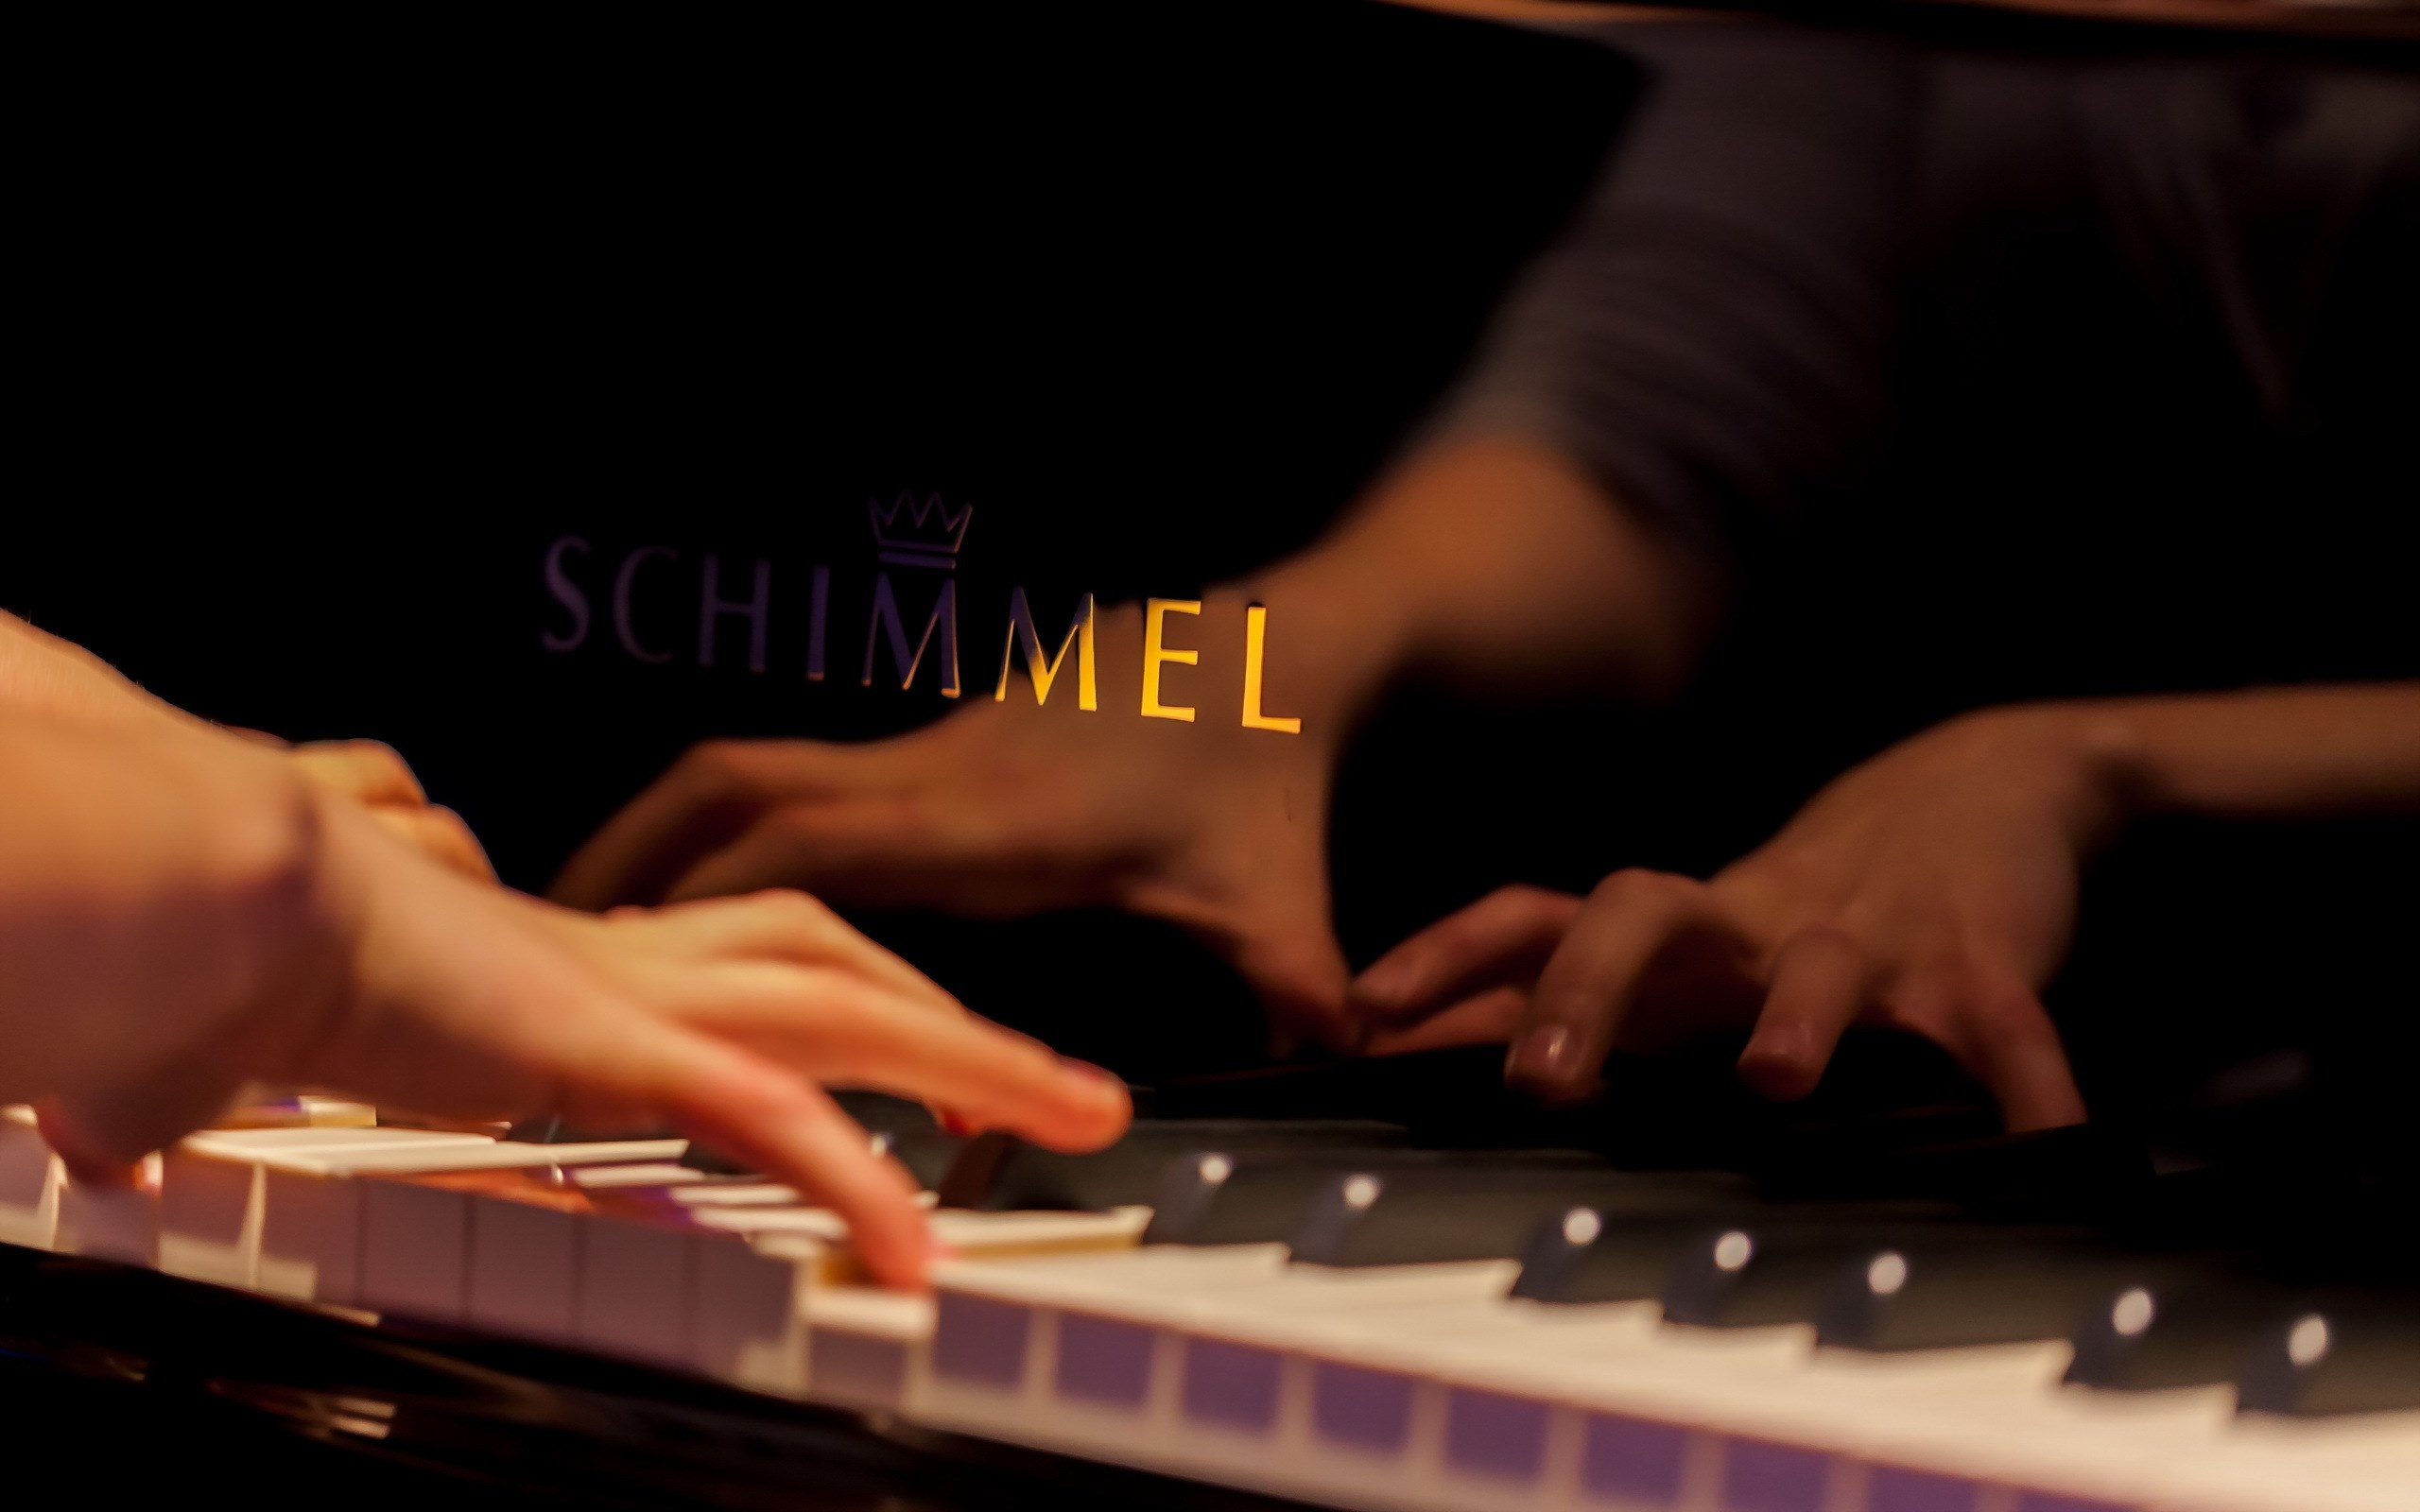 Piano Schimmel Music